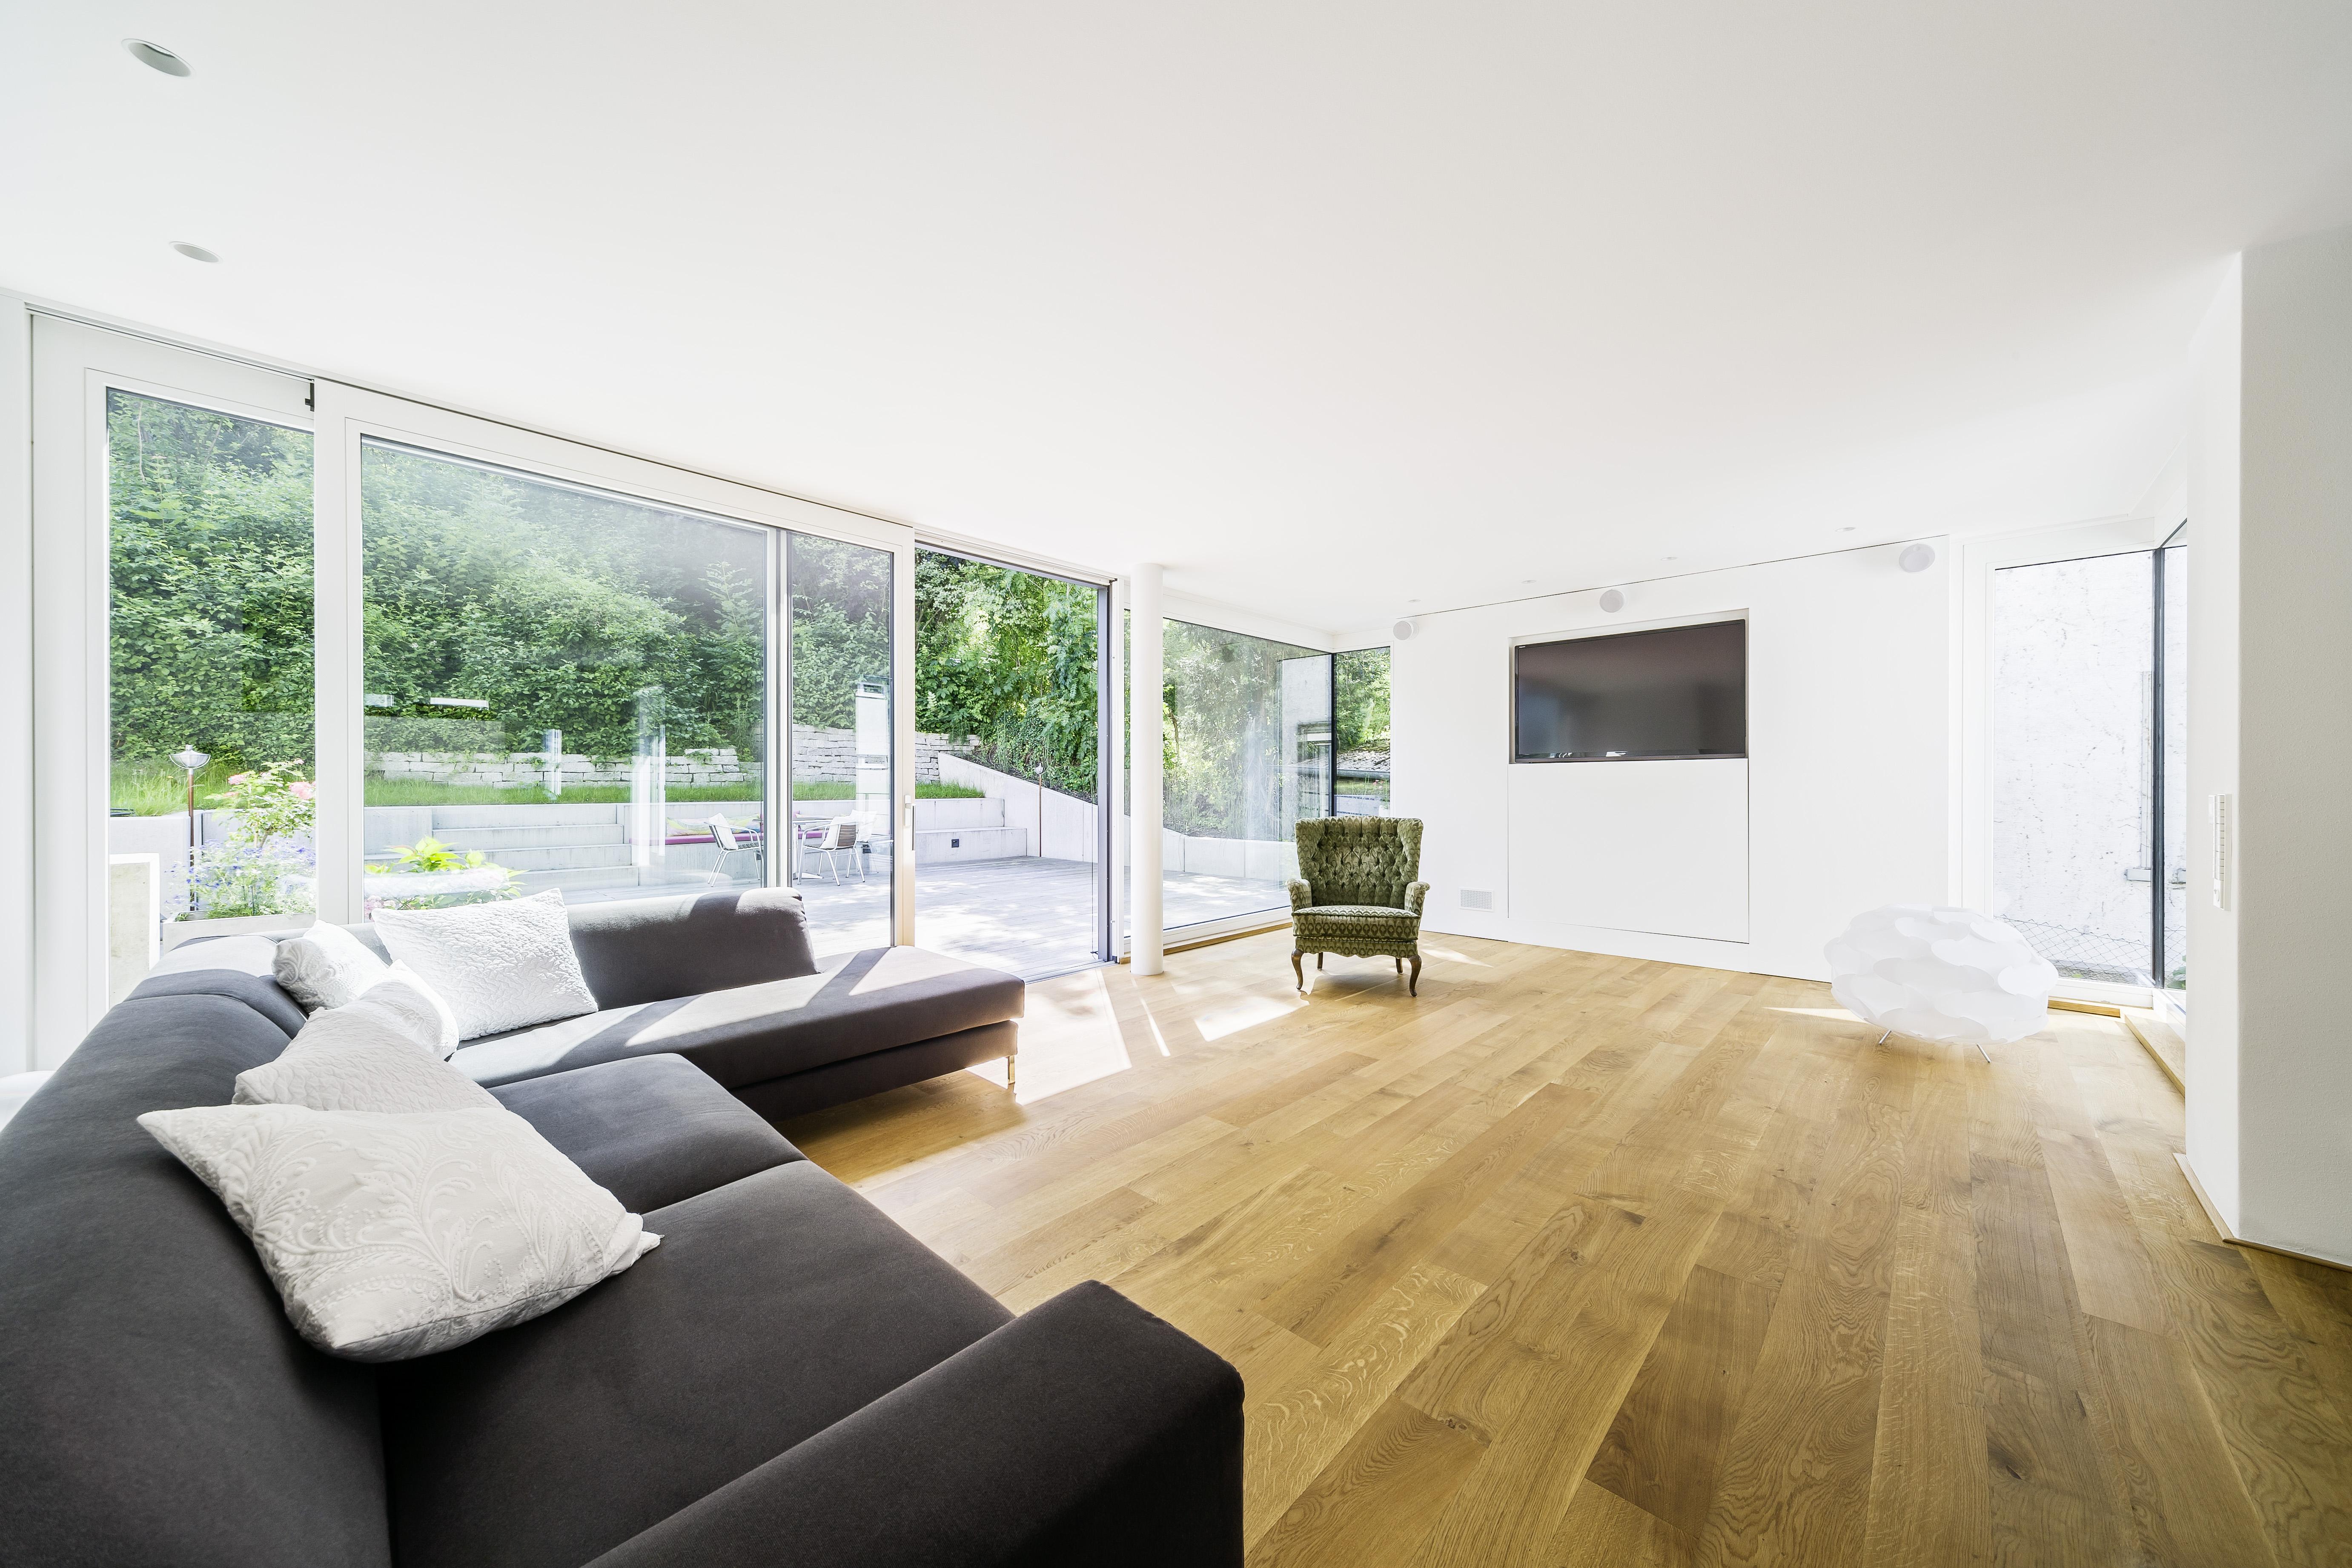 exklusivit t und moderne holzfenster schaefer markdorf. Black Bedroom Furniture Sets. Home Design Ideas